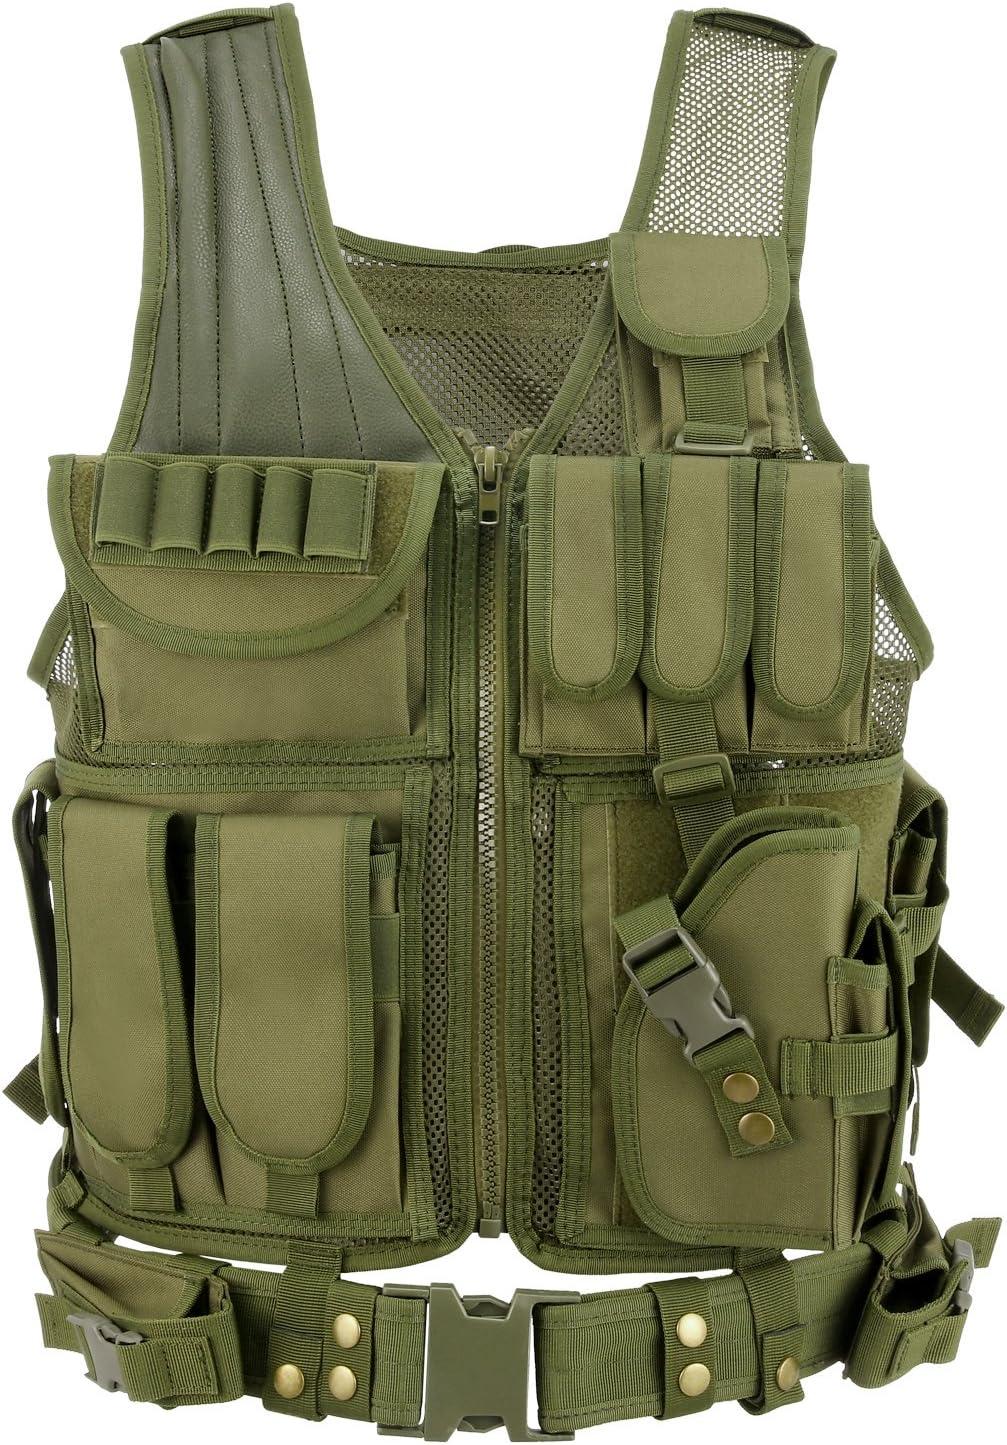 Gonex Chaleco T/áctico de Hombre Militar MOLLE Chaqueta Antibalas de Protecci/ón Camuflaje para Airsoft CS Game Paintball Swat Policia Combate Cosplay Entrenamiento Formaci/ón Caza Deporte al Aire Libre